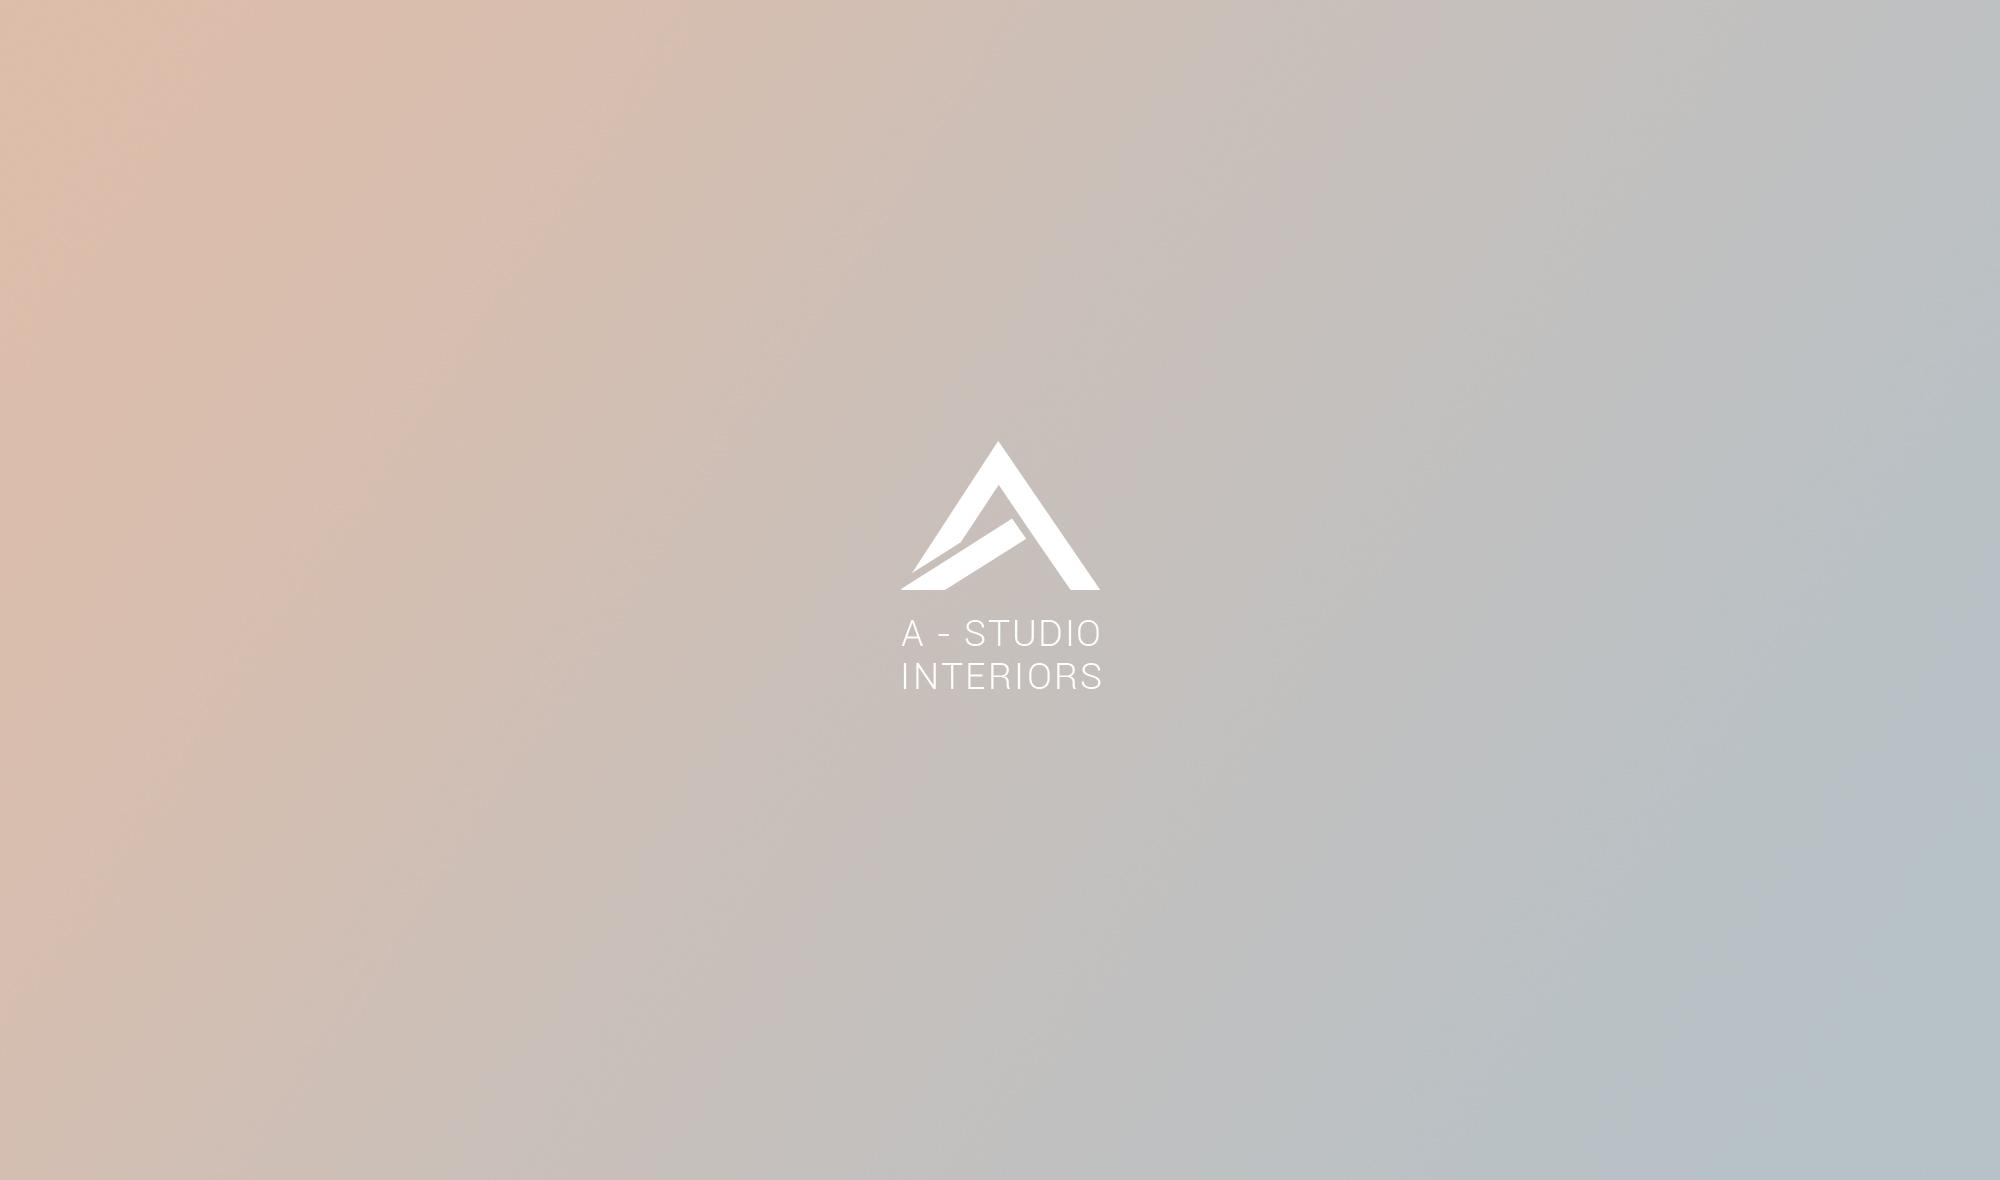 Rebranding of A-studio Interiors / World Brand Design Society